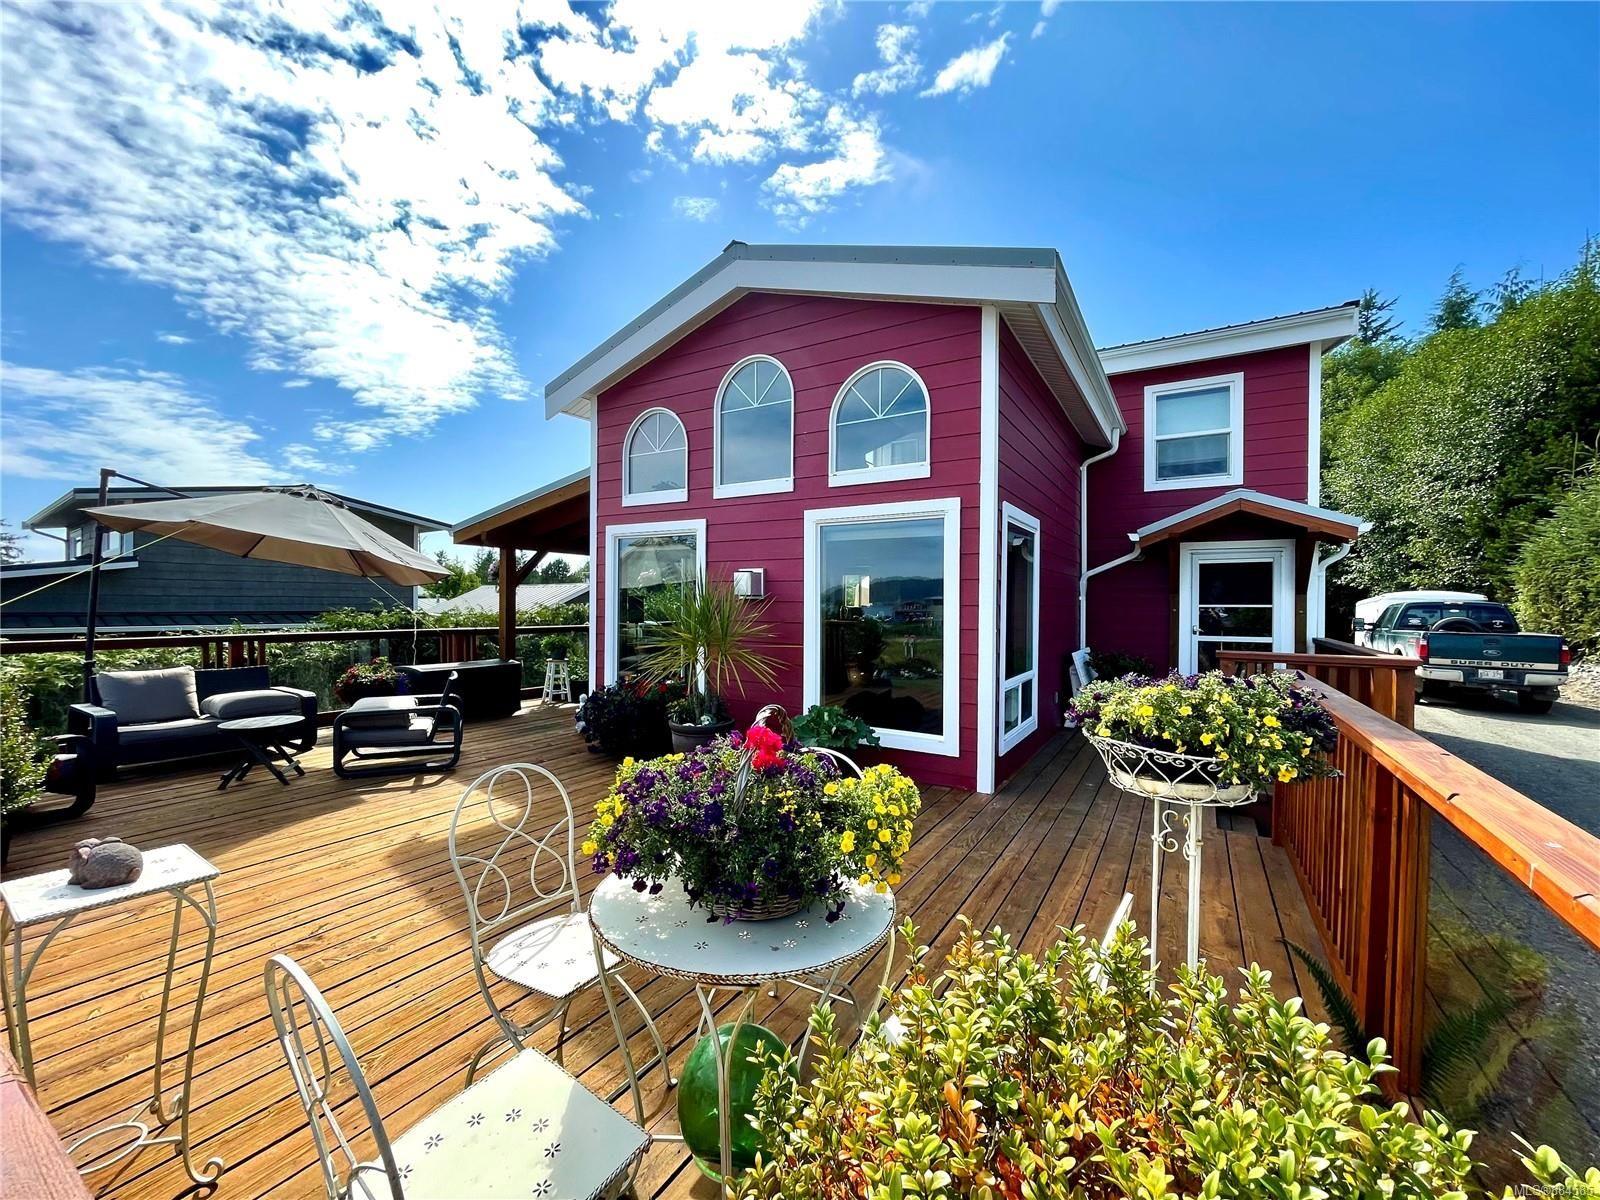 Main Photo: 1045 7th Ave in : PA Salmon Beach House for sale (Port Alberni)  : MLS®# 884585